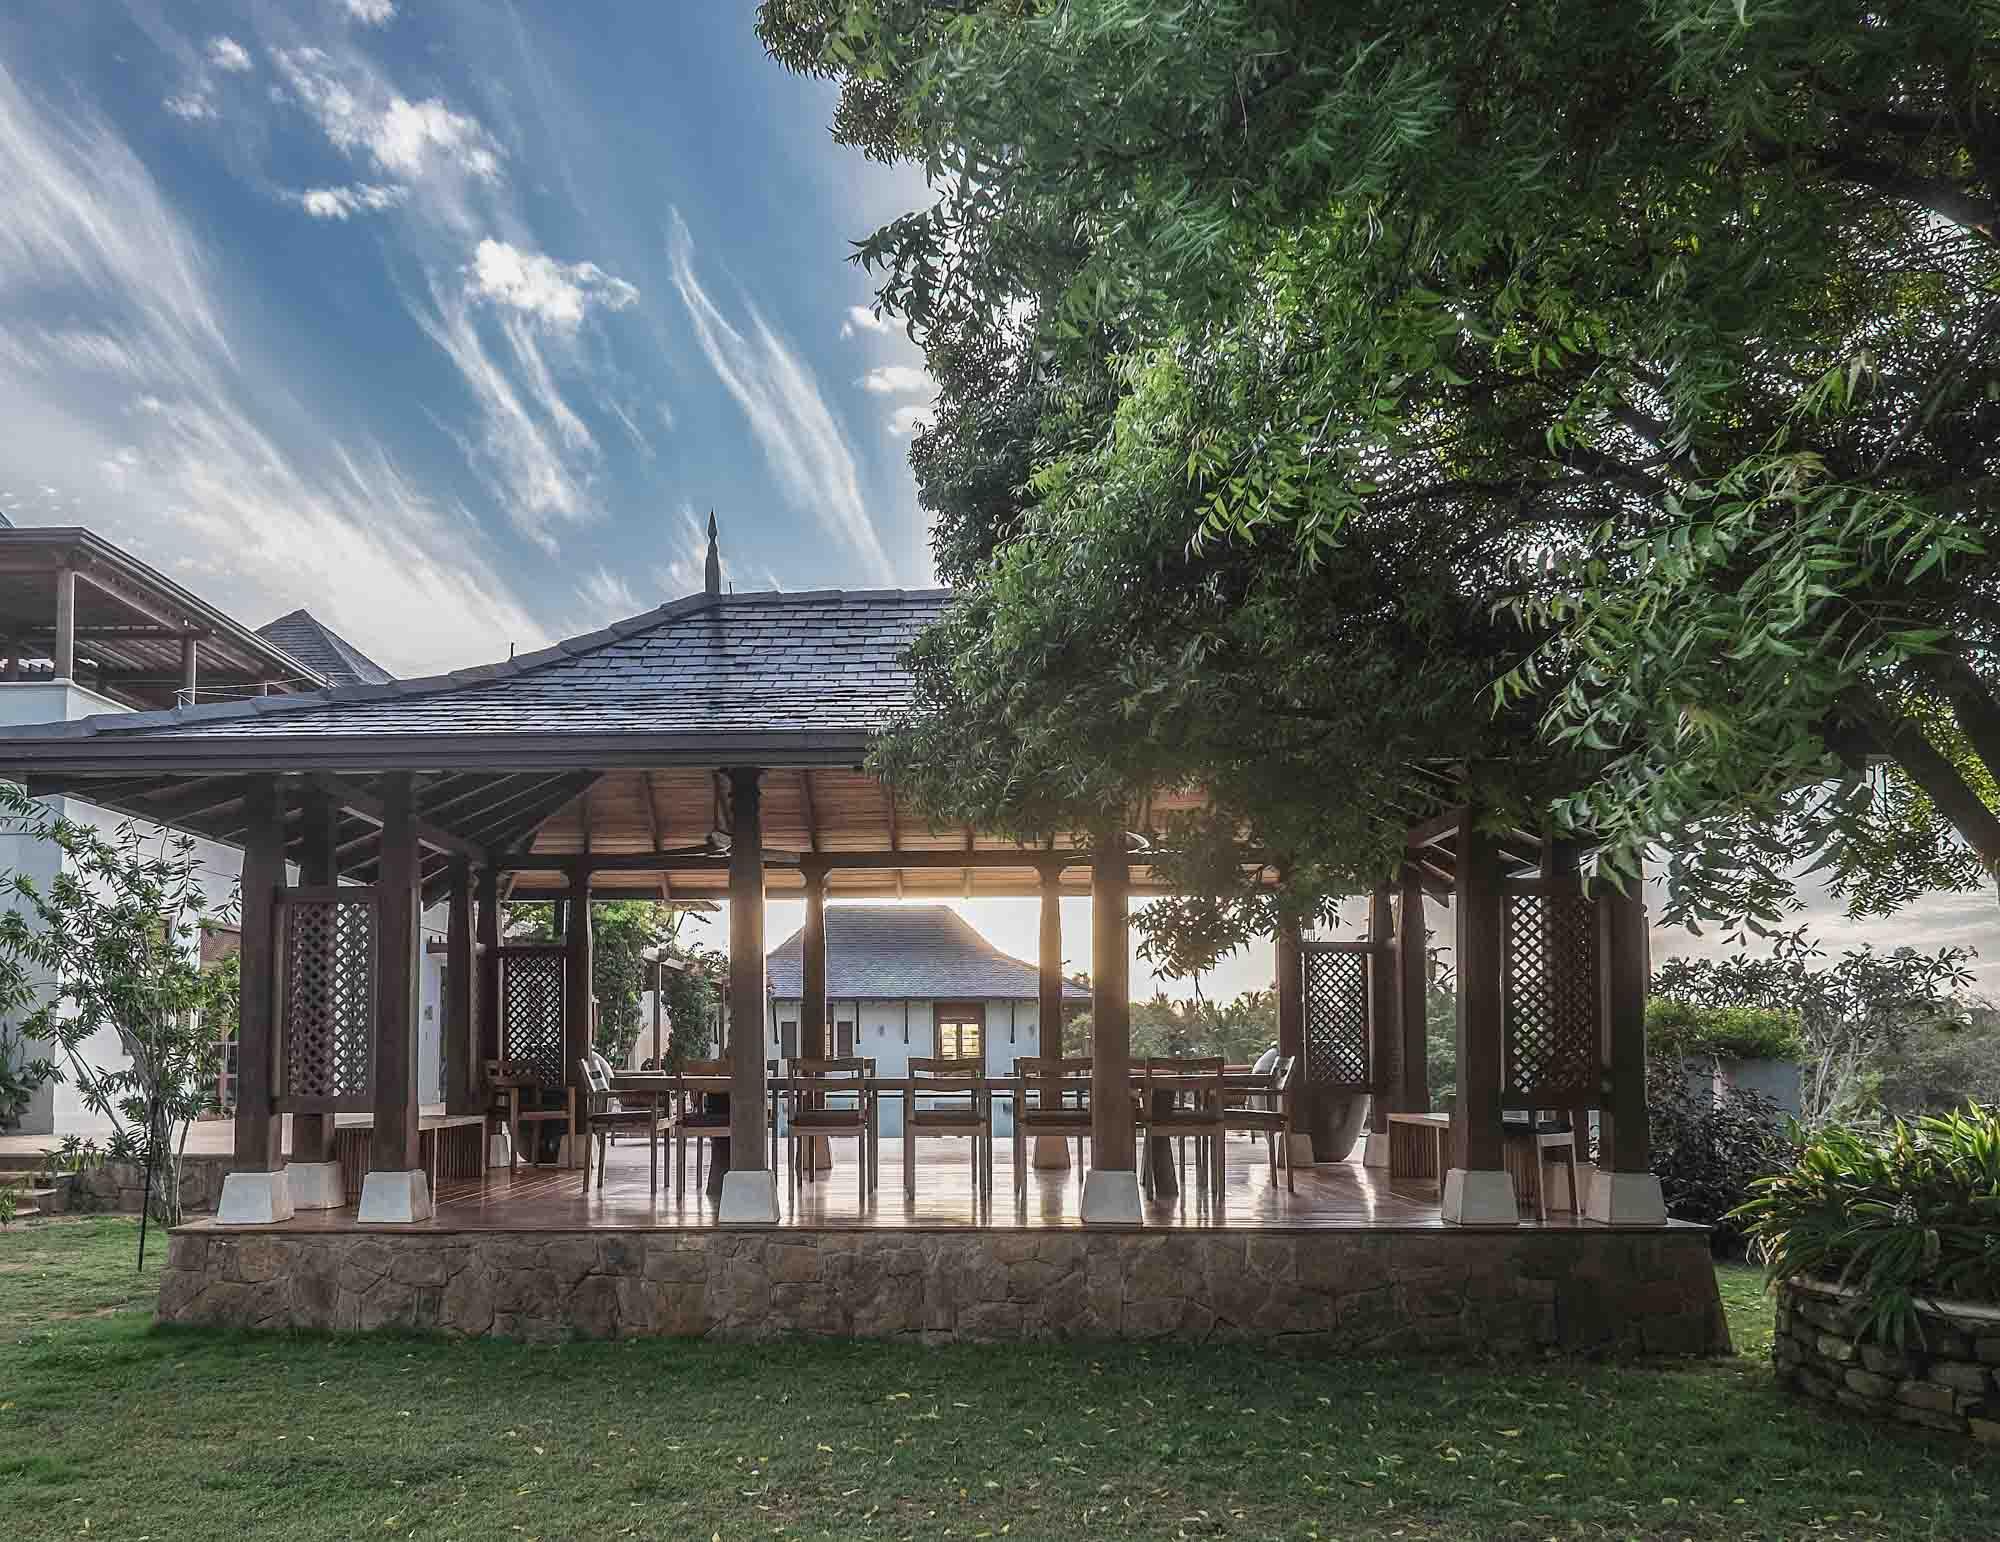 Book Villa Ranawara Luxury Vacation Rentals By Zekkei